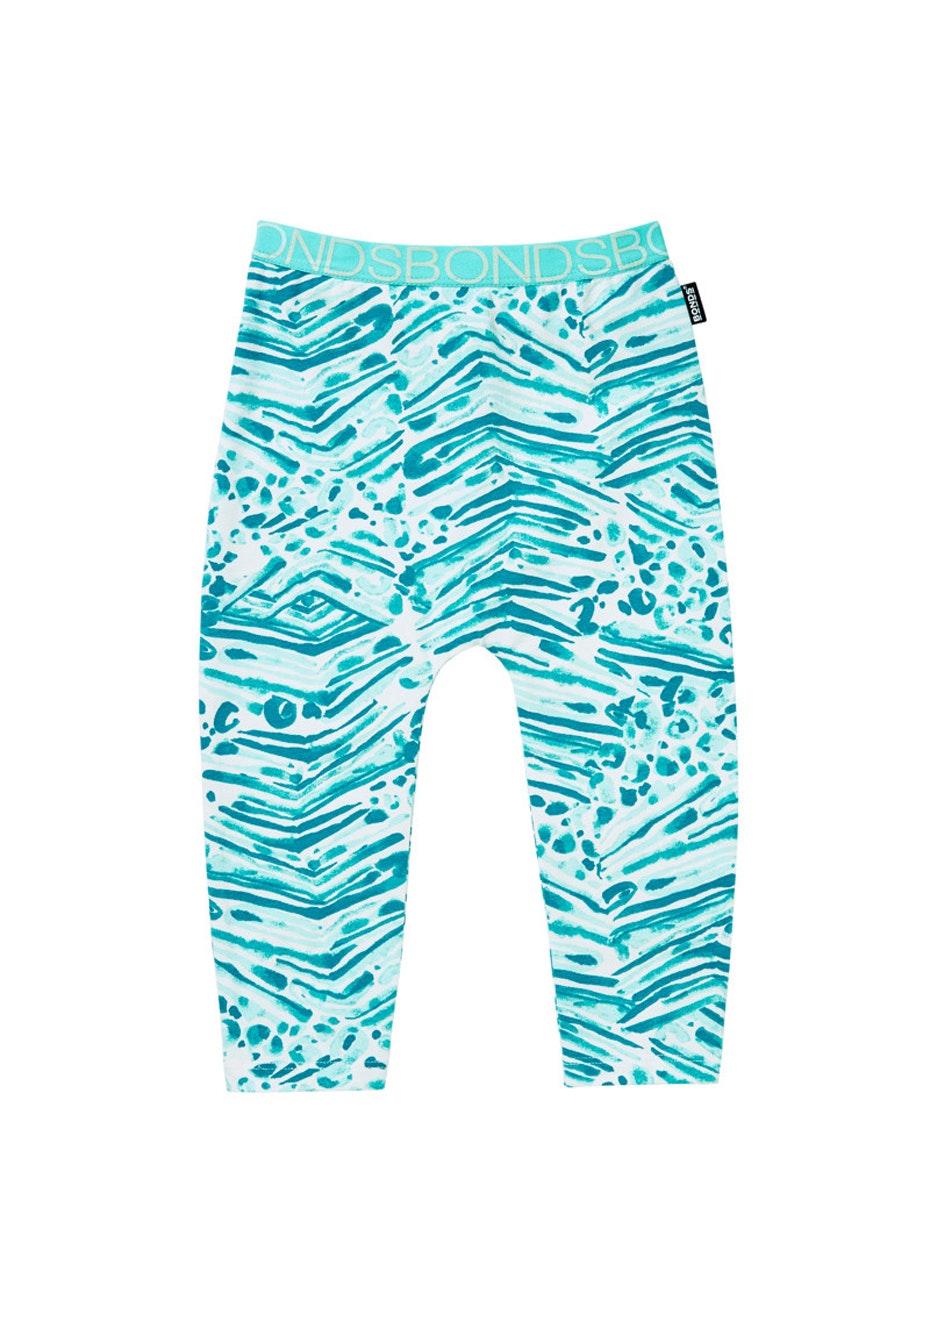 BONDS - Stretchies Print Legging - Print 42